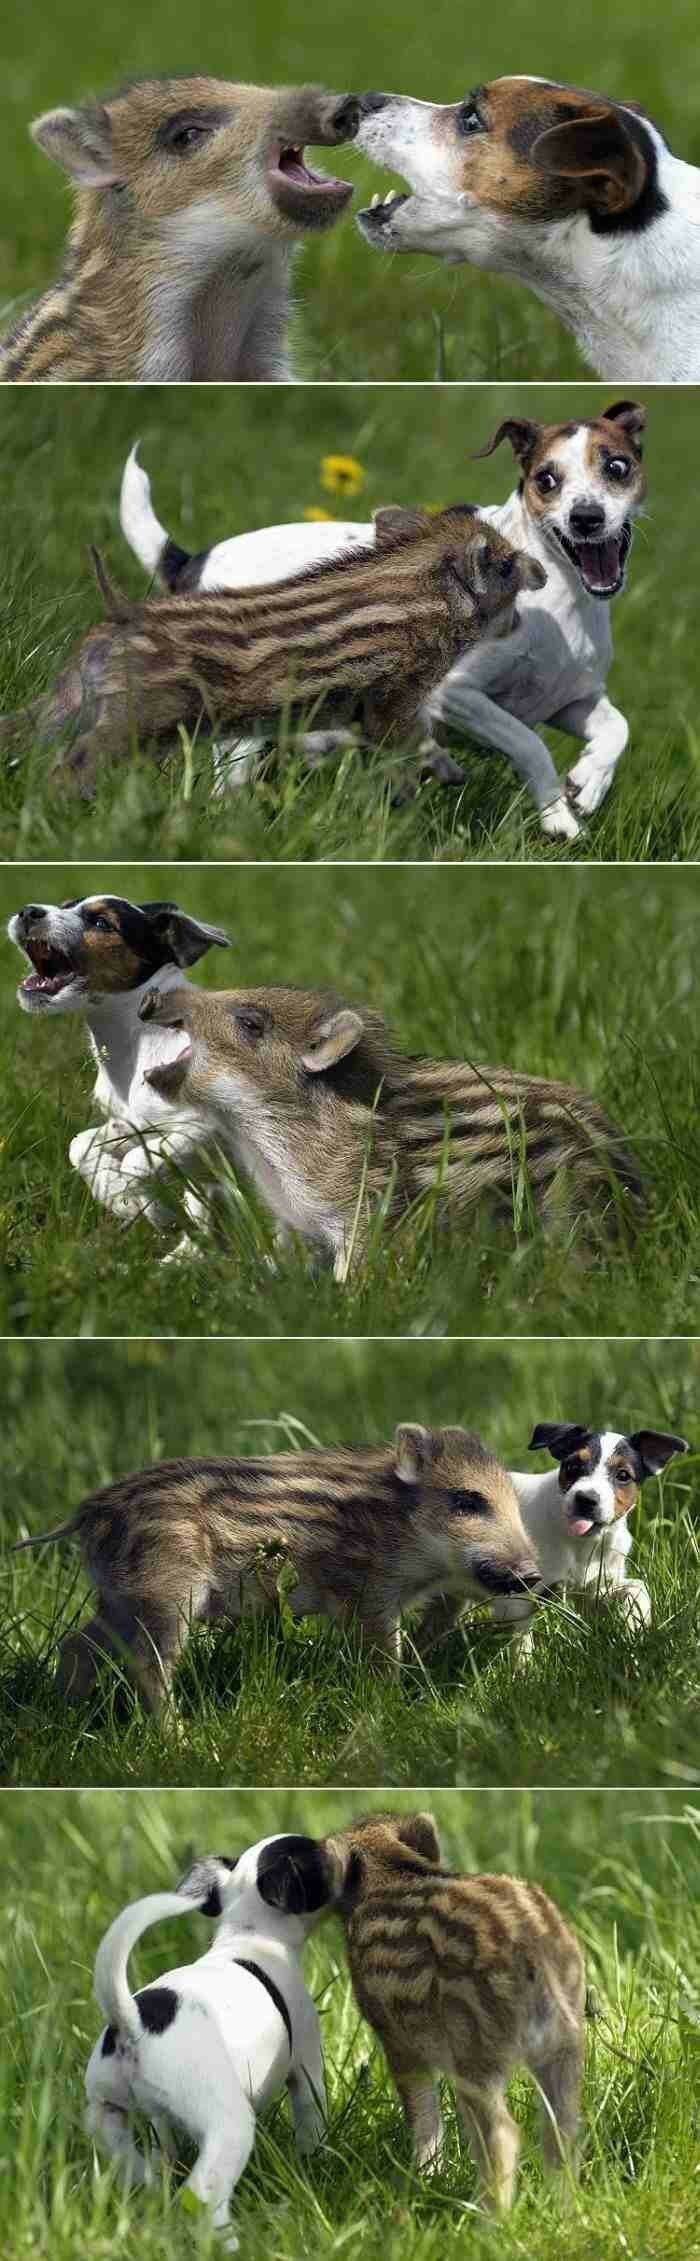 Собака и кабанчик.